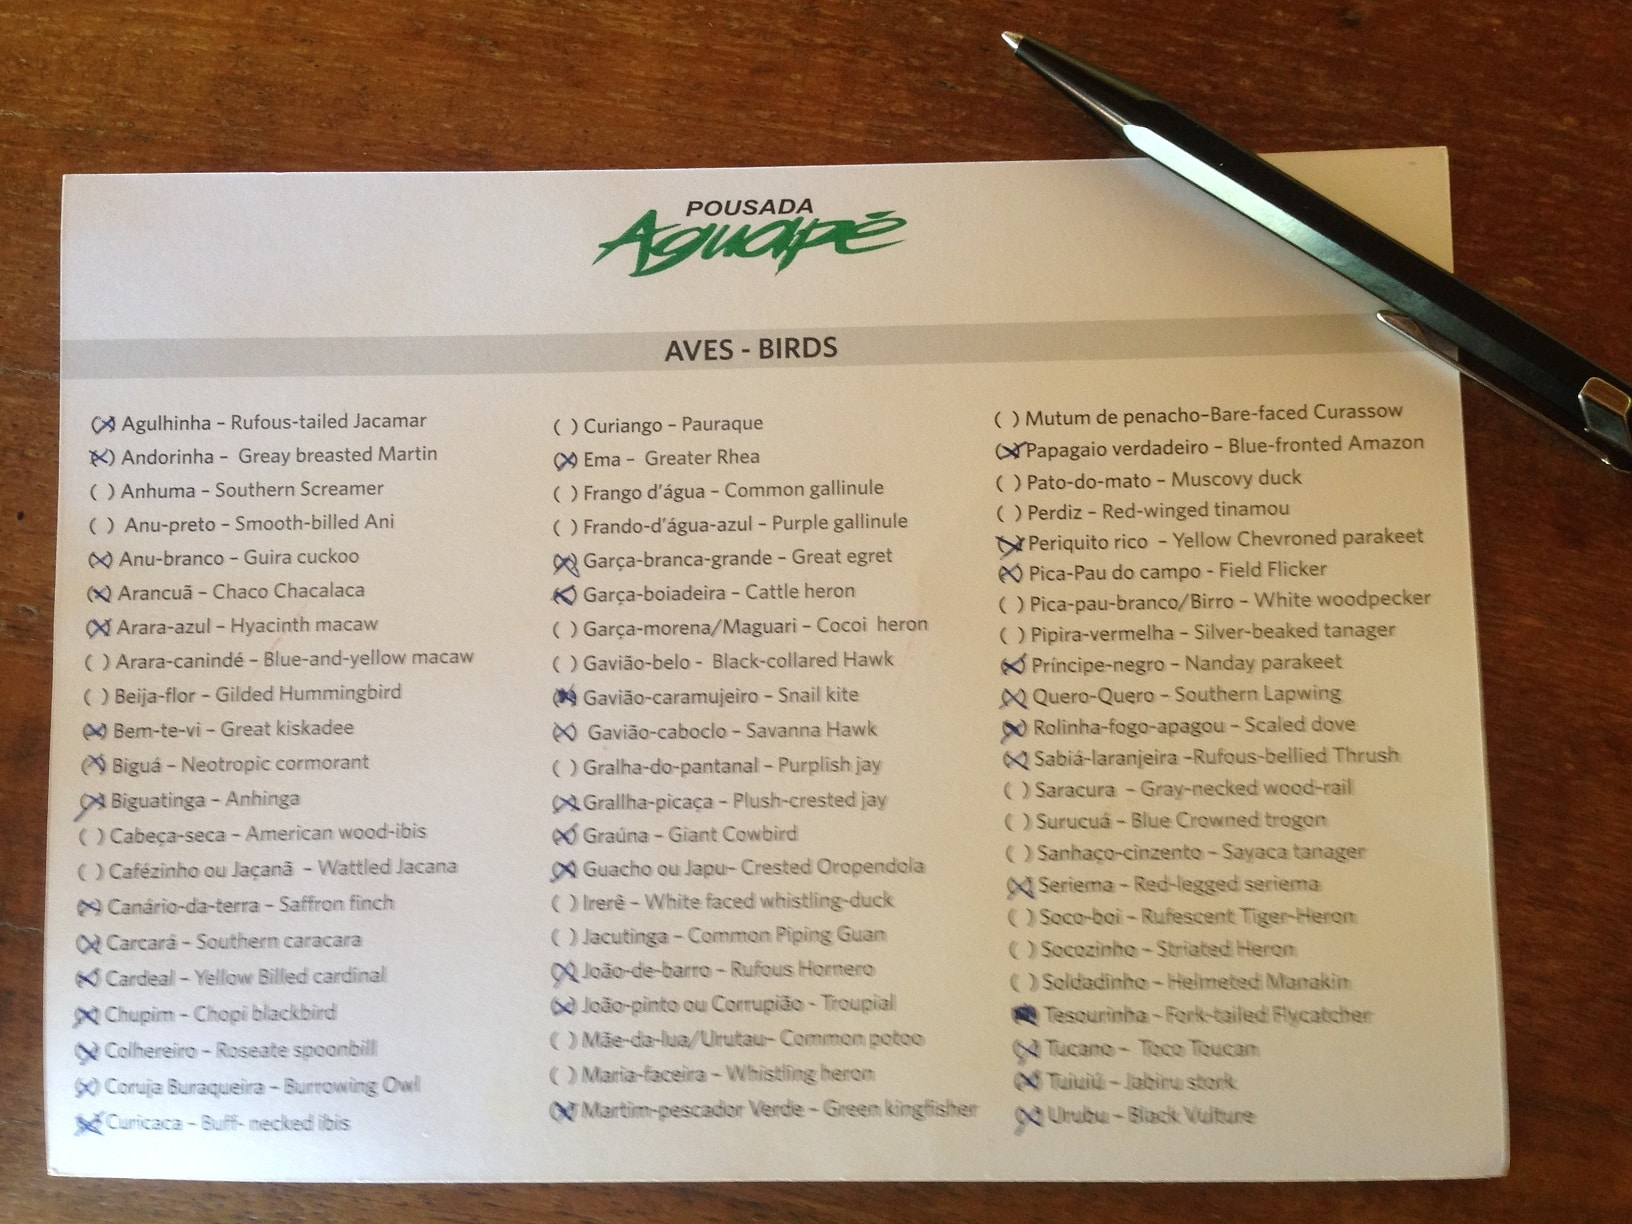 pantanal_bresil_pousada_aguape_checklist_oiseaux